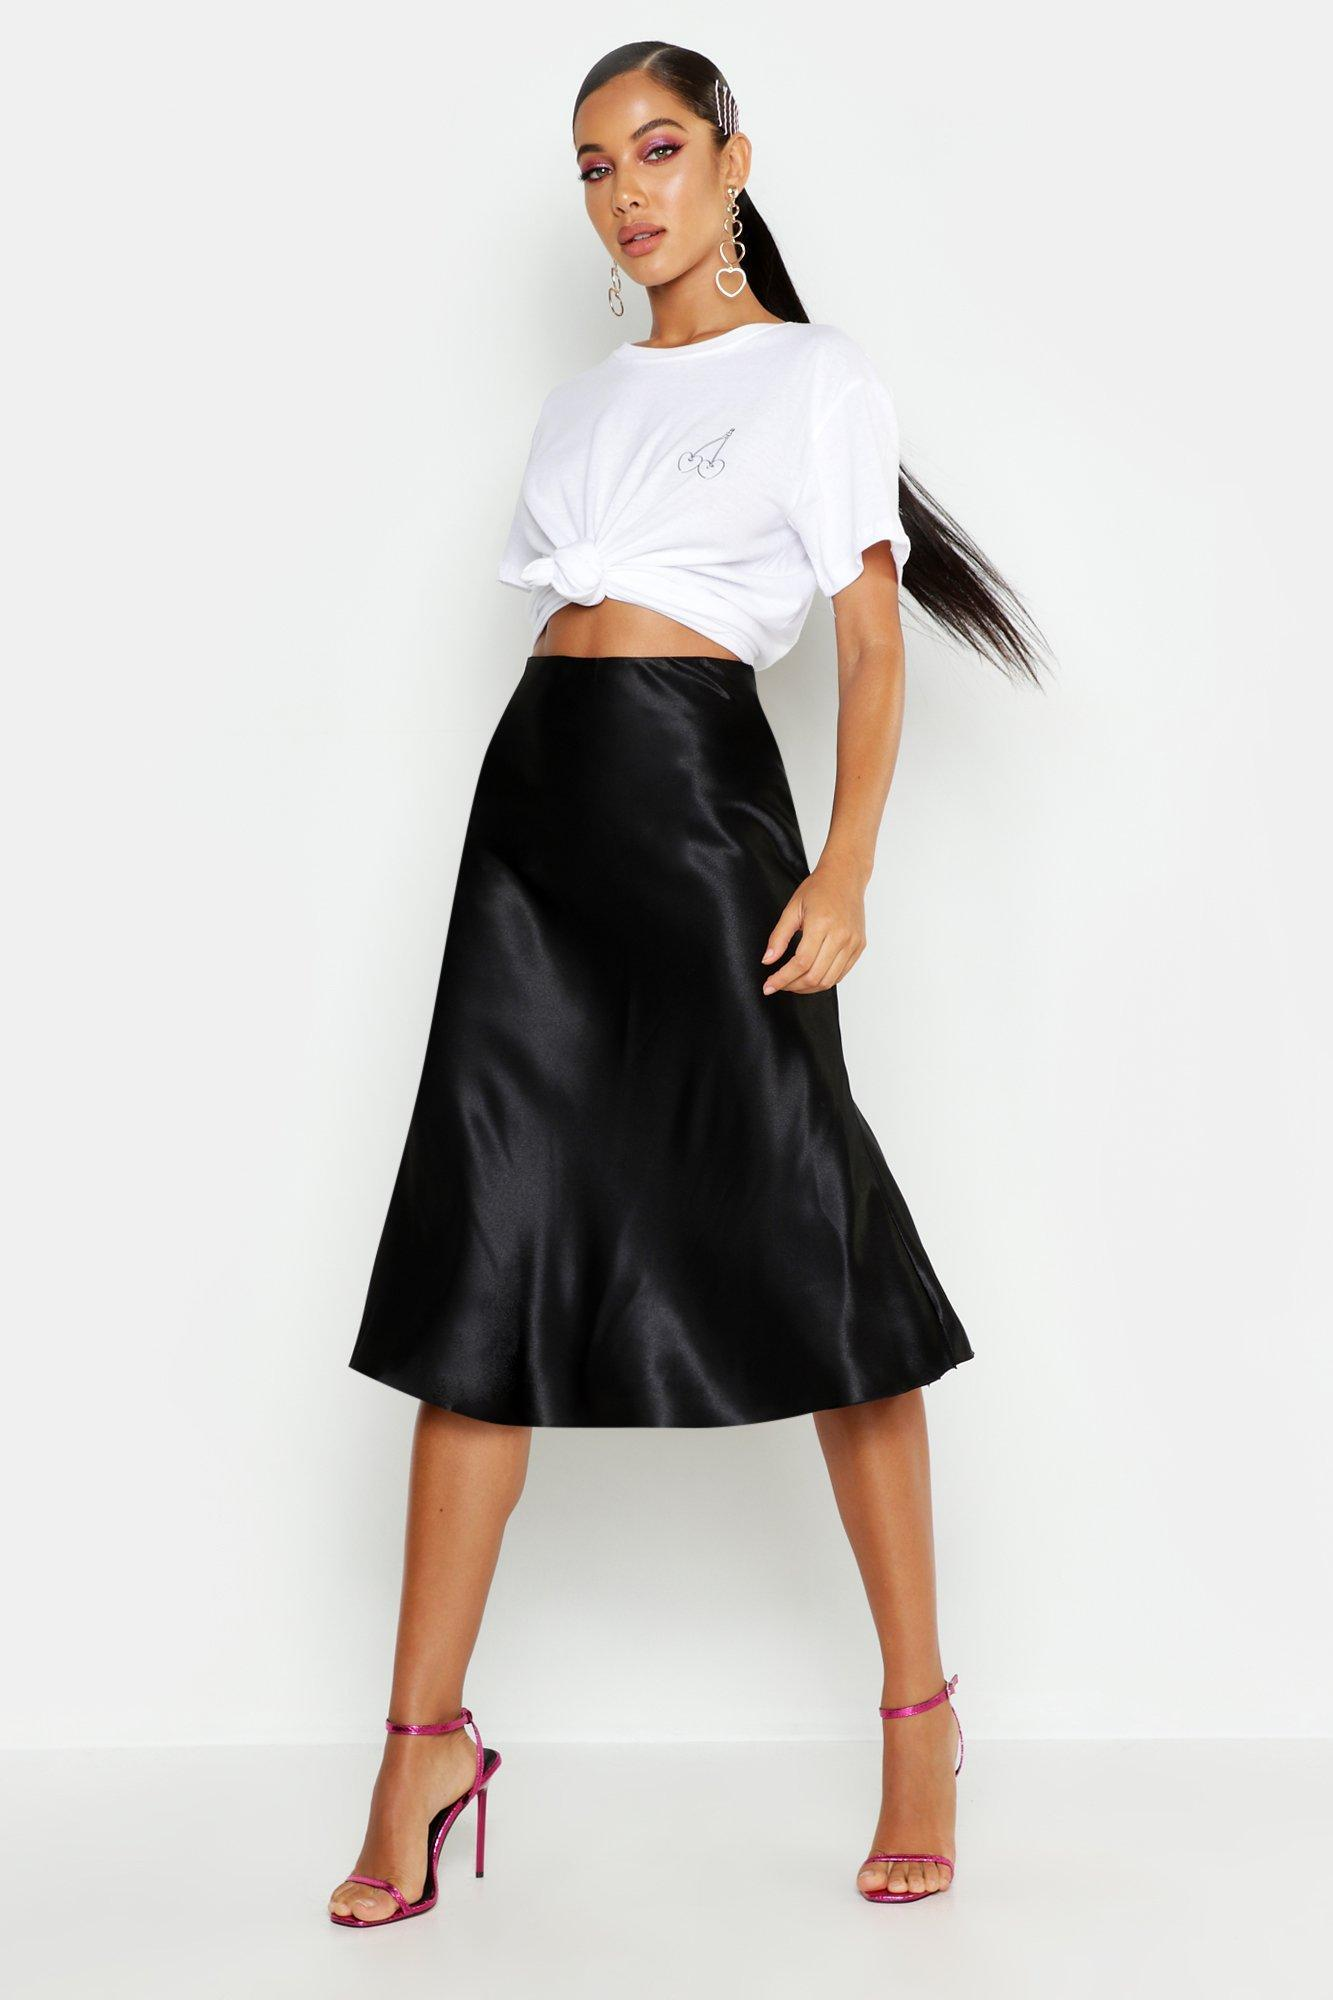 071e59414 Boohoo - Black Satin Bias Cut Slip Midi Skirt - Lyst. View fullscreen